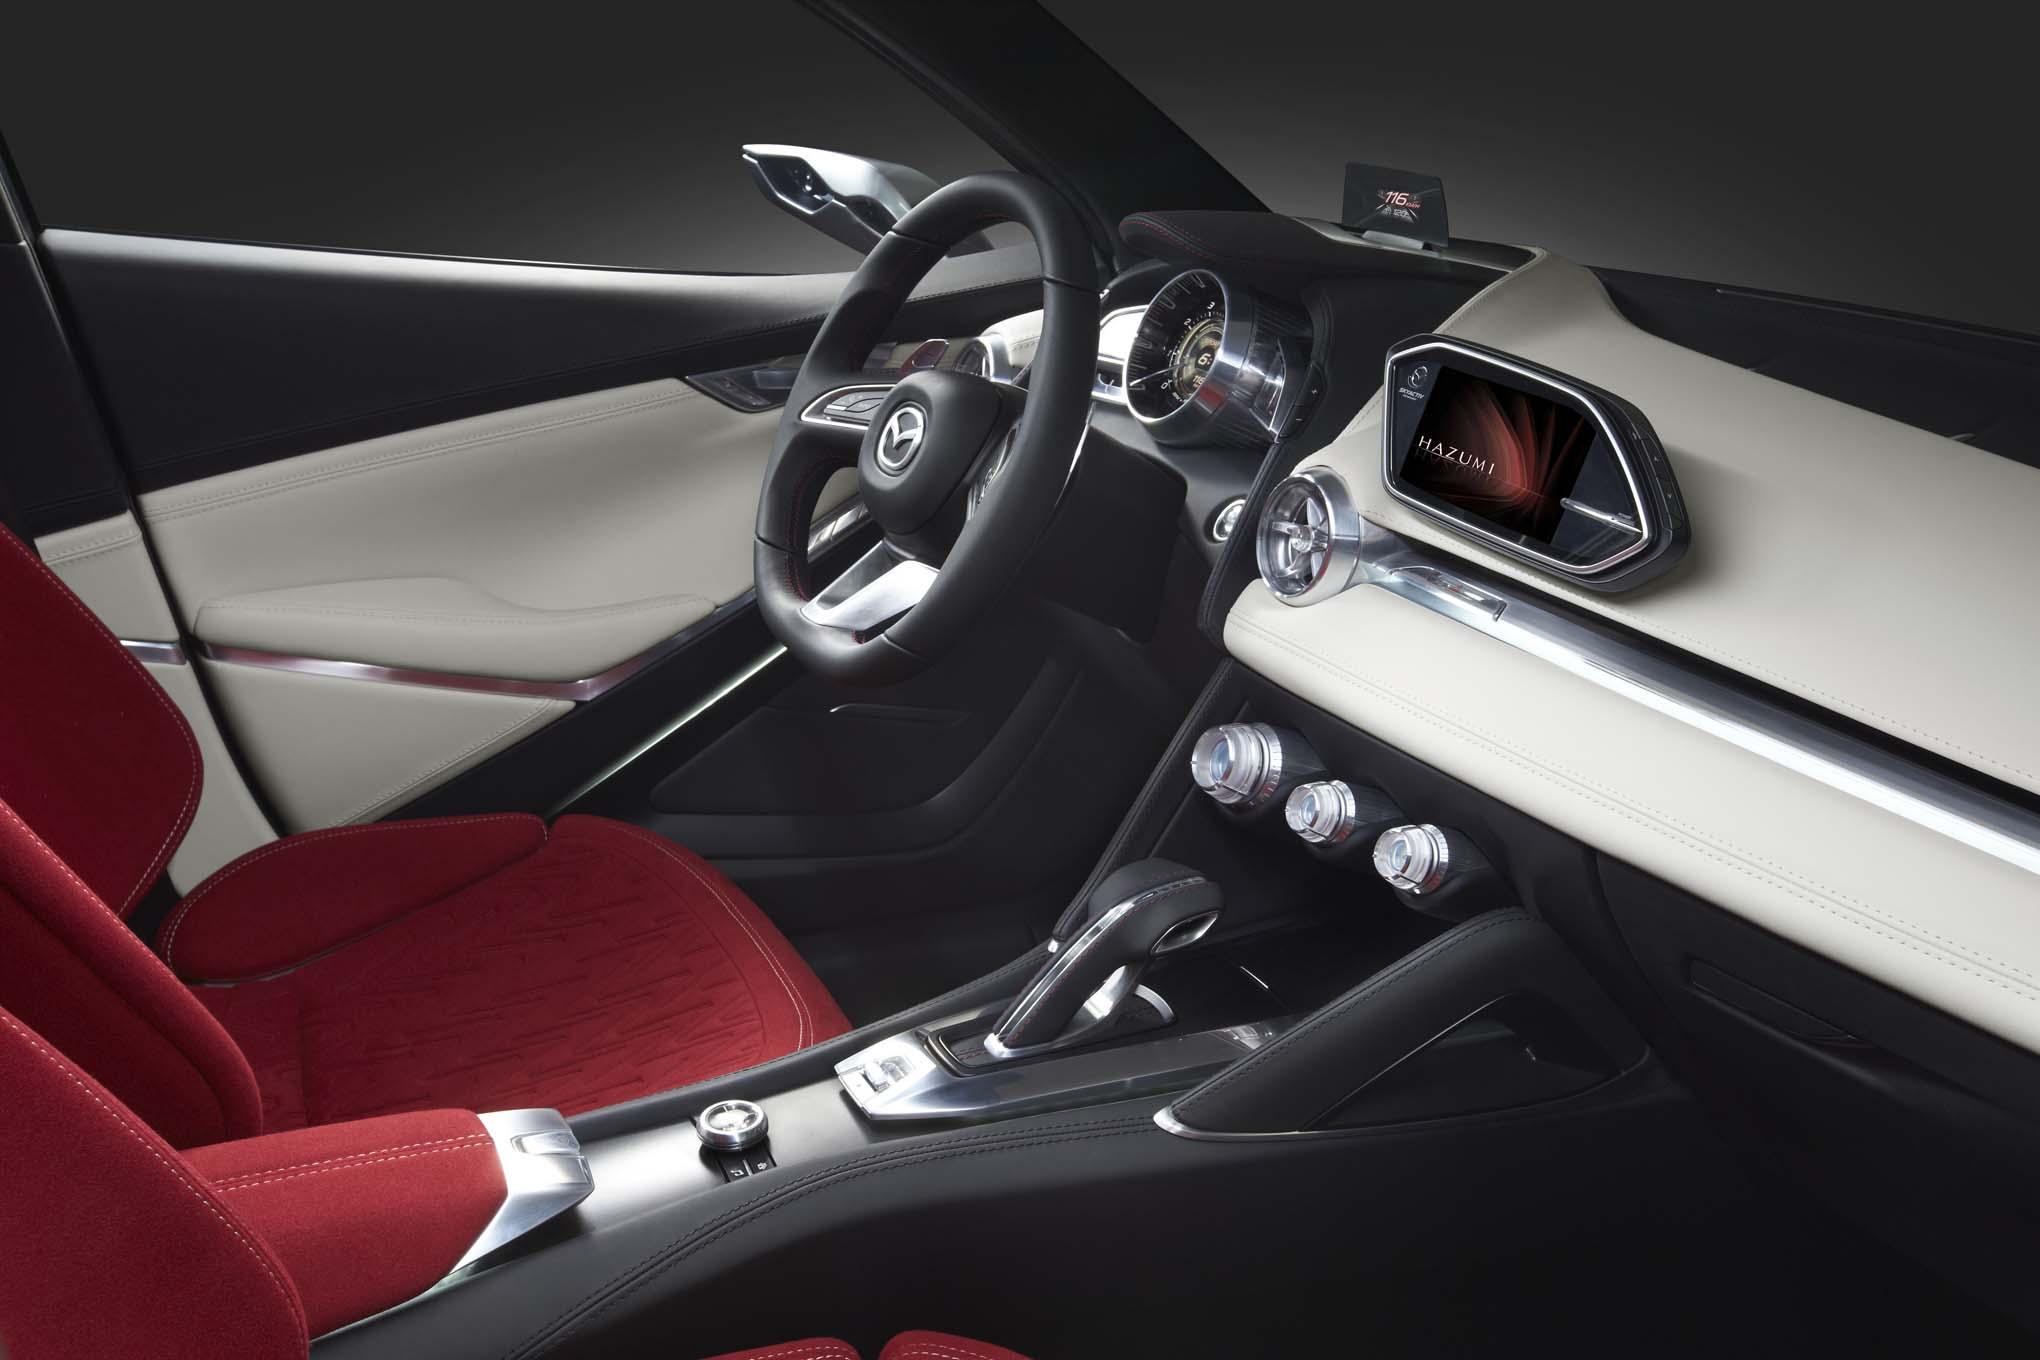 https://st.automobilemag.com/uploads/sites/11/2014/03/Mazda-Hazumi-Concept-interior-03.jpg